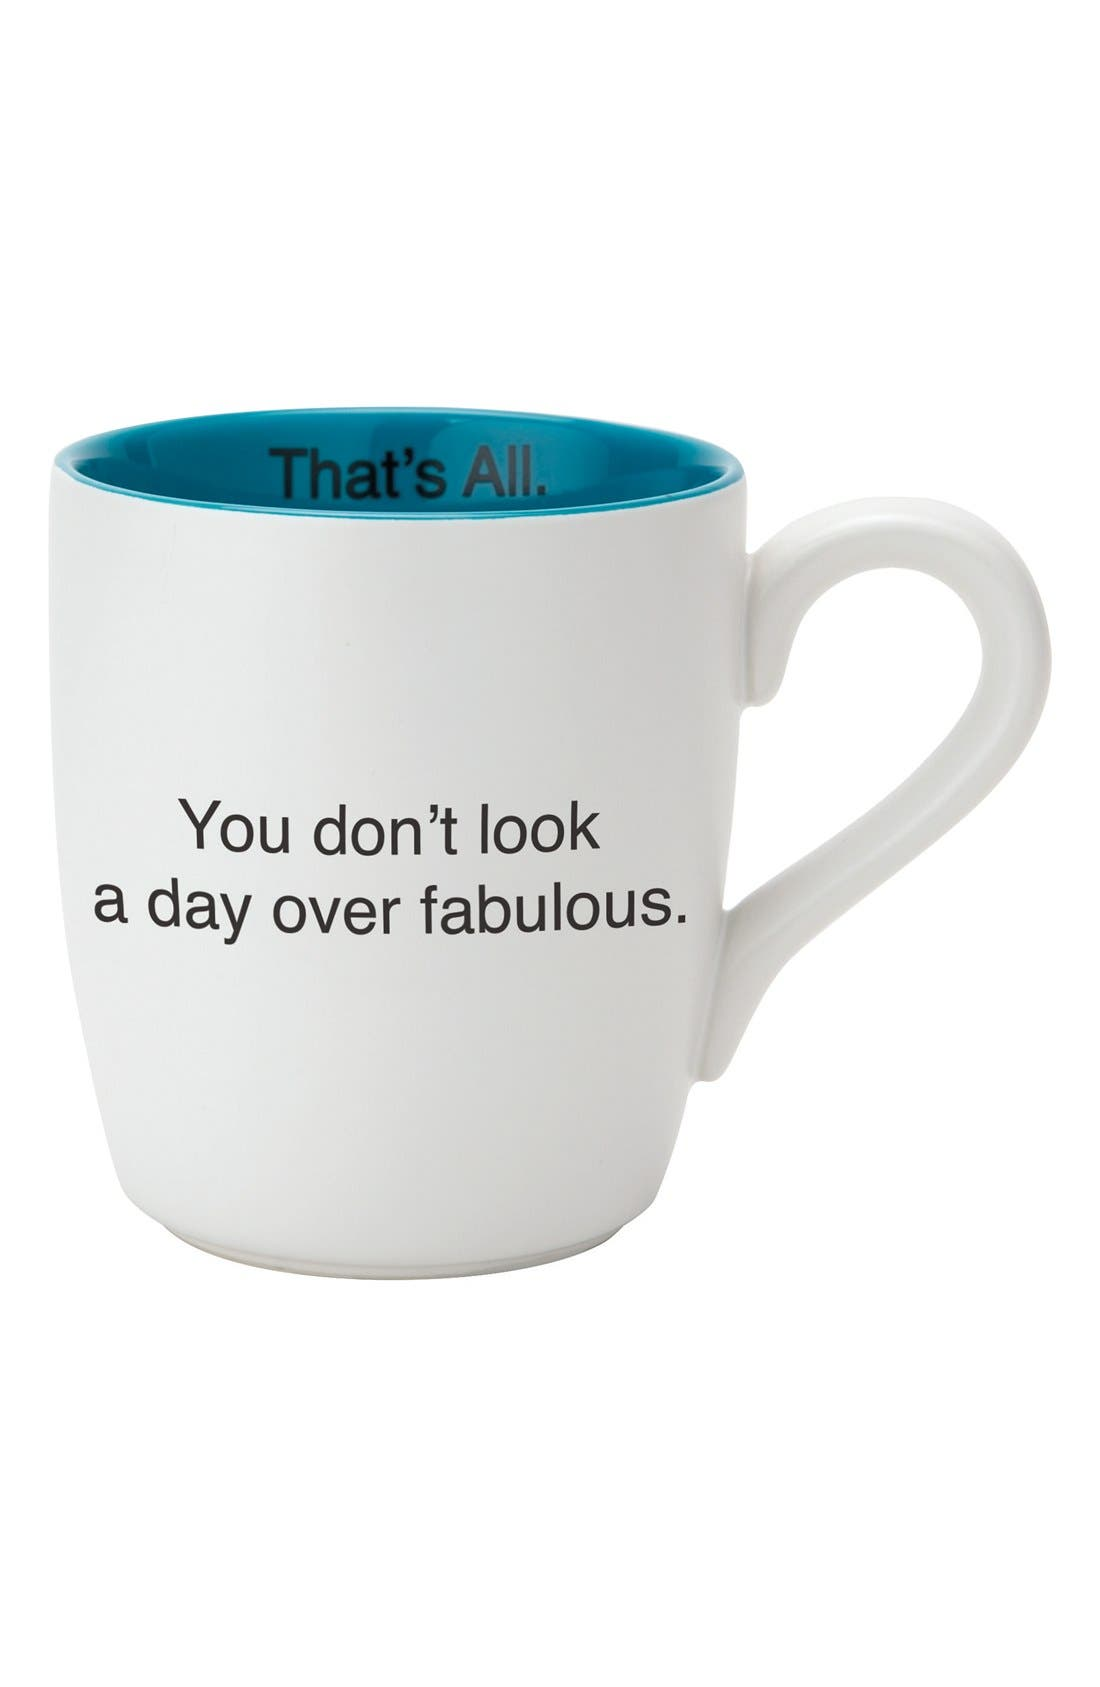 'Fabulous - That's All' Mug,                             Main thumbnail 1, color,                             100